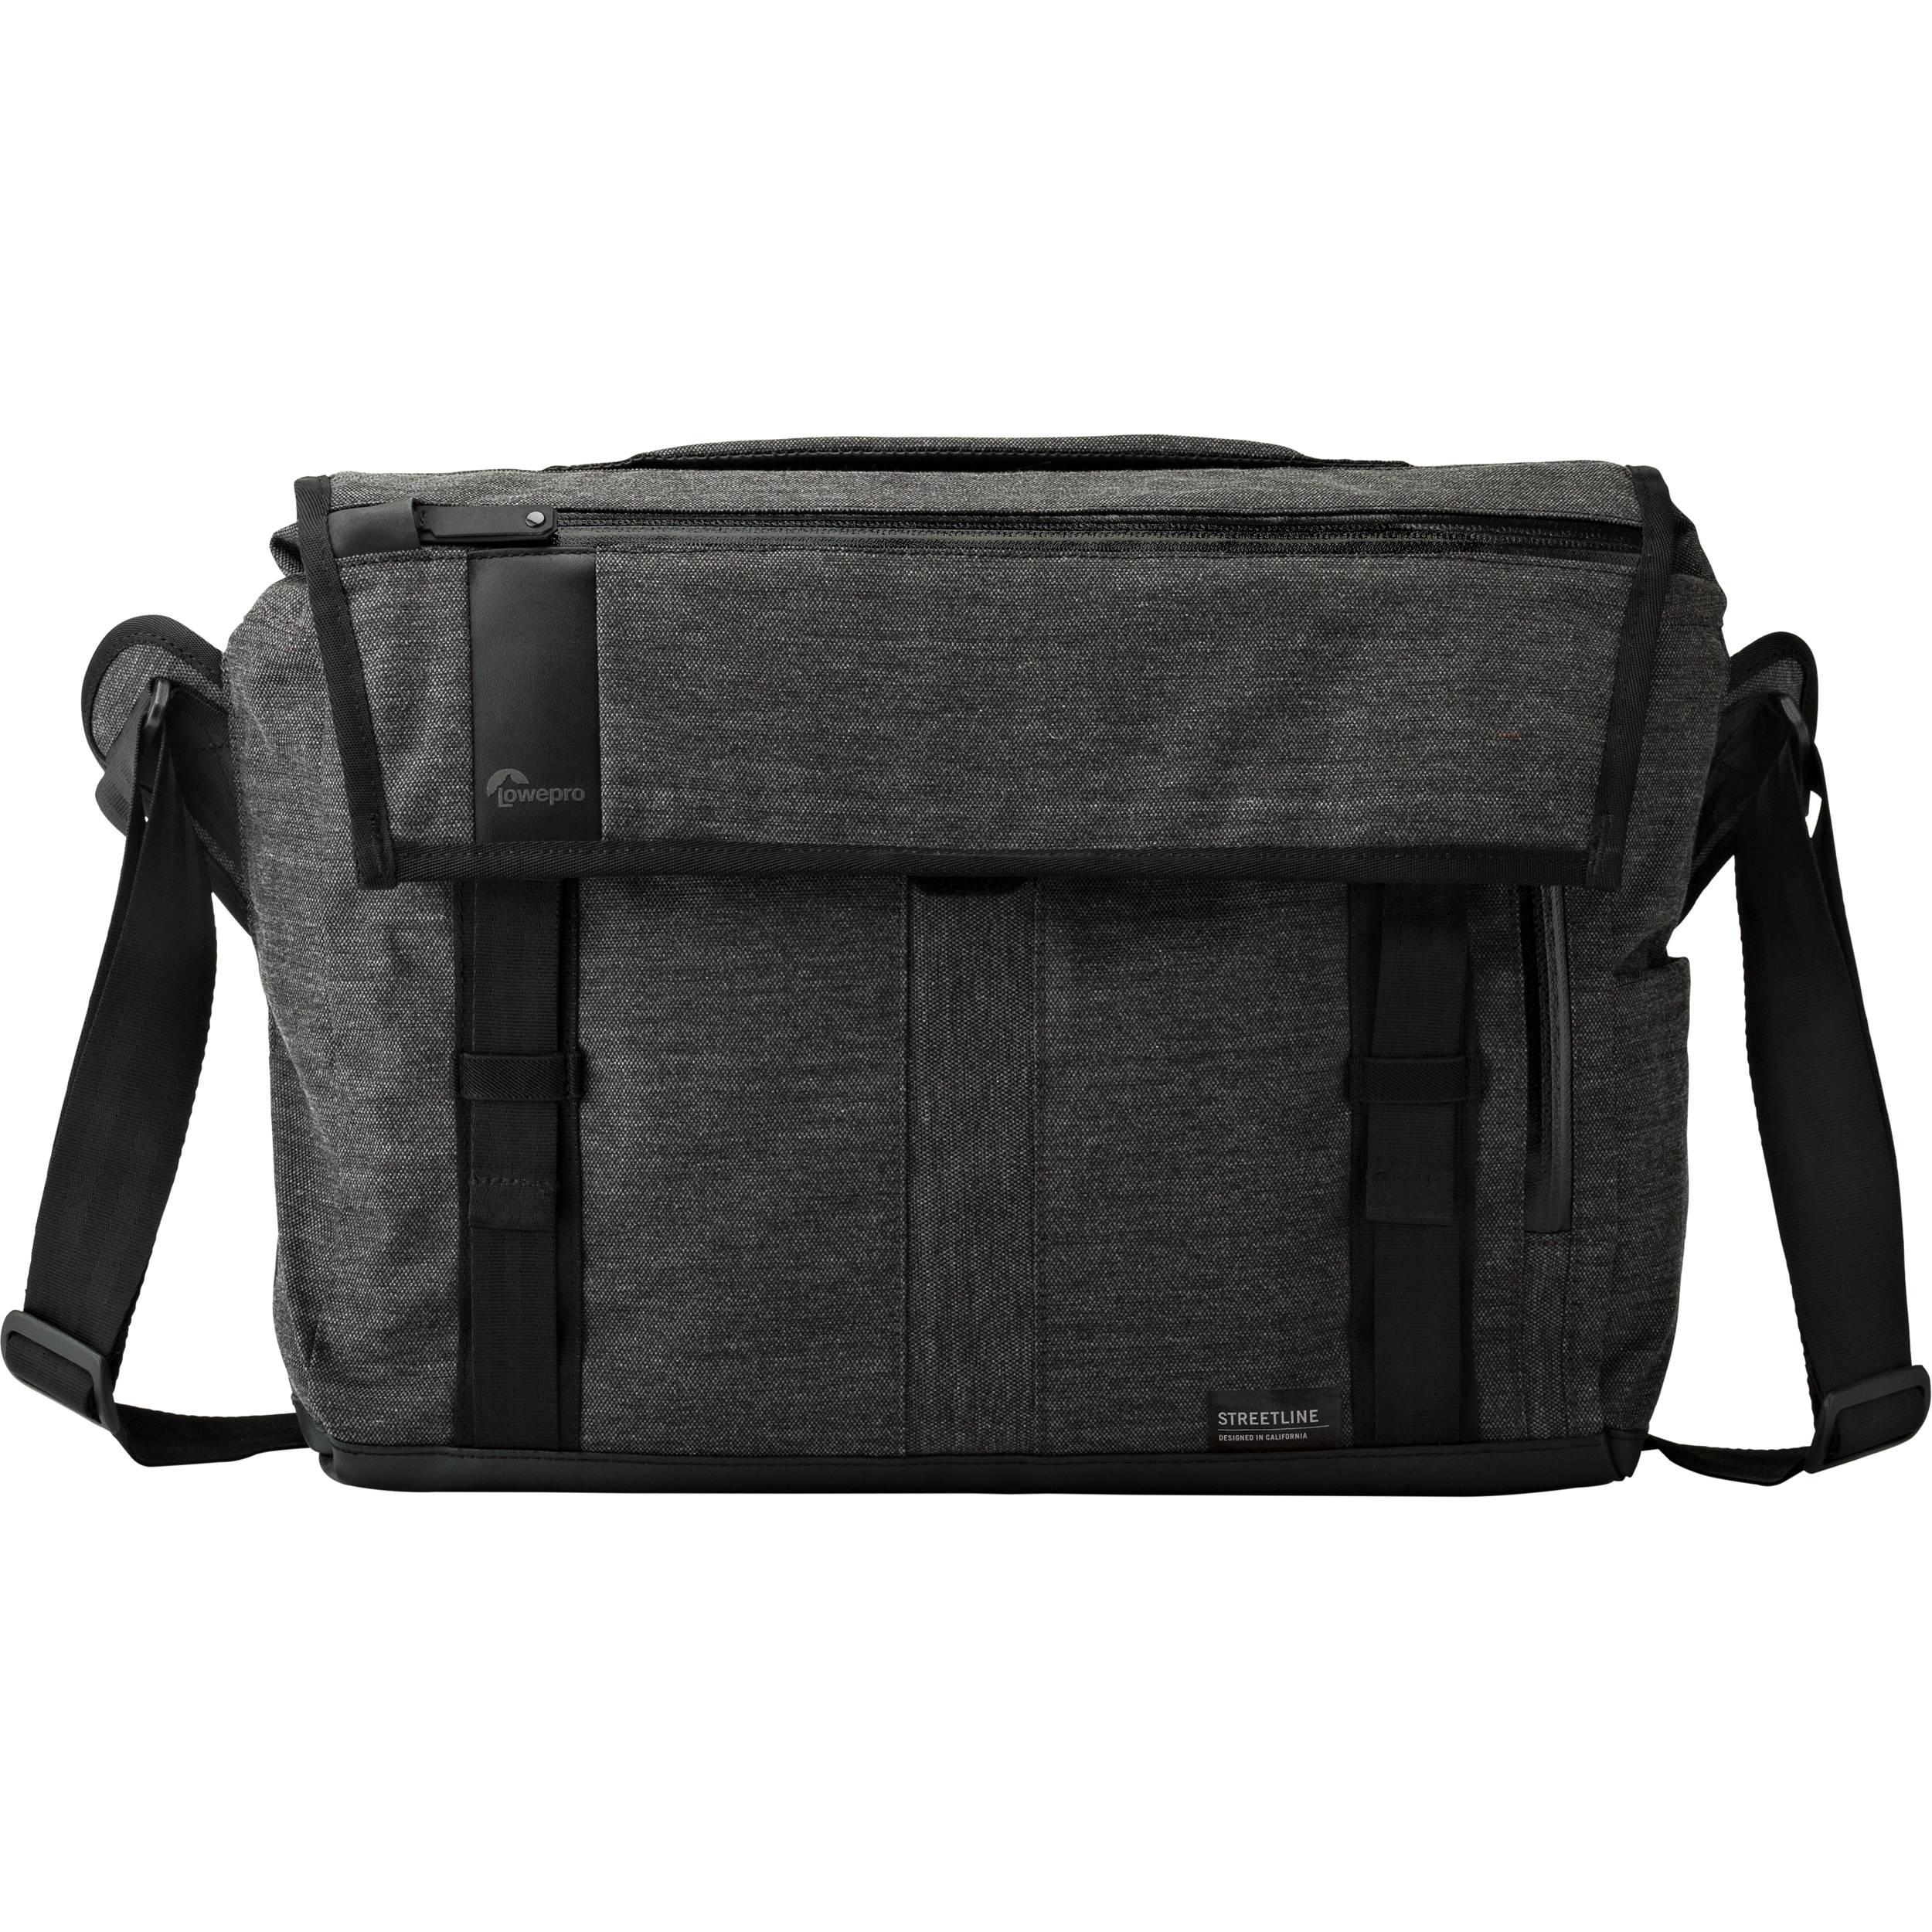 009cc4f0a1 Lowepro StreetLine SH 180 Bag (Charcoal Gray) LP36944 B H Photo